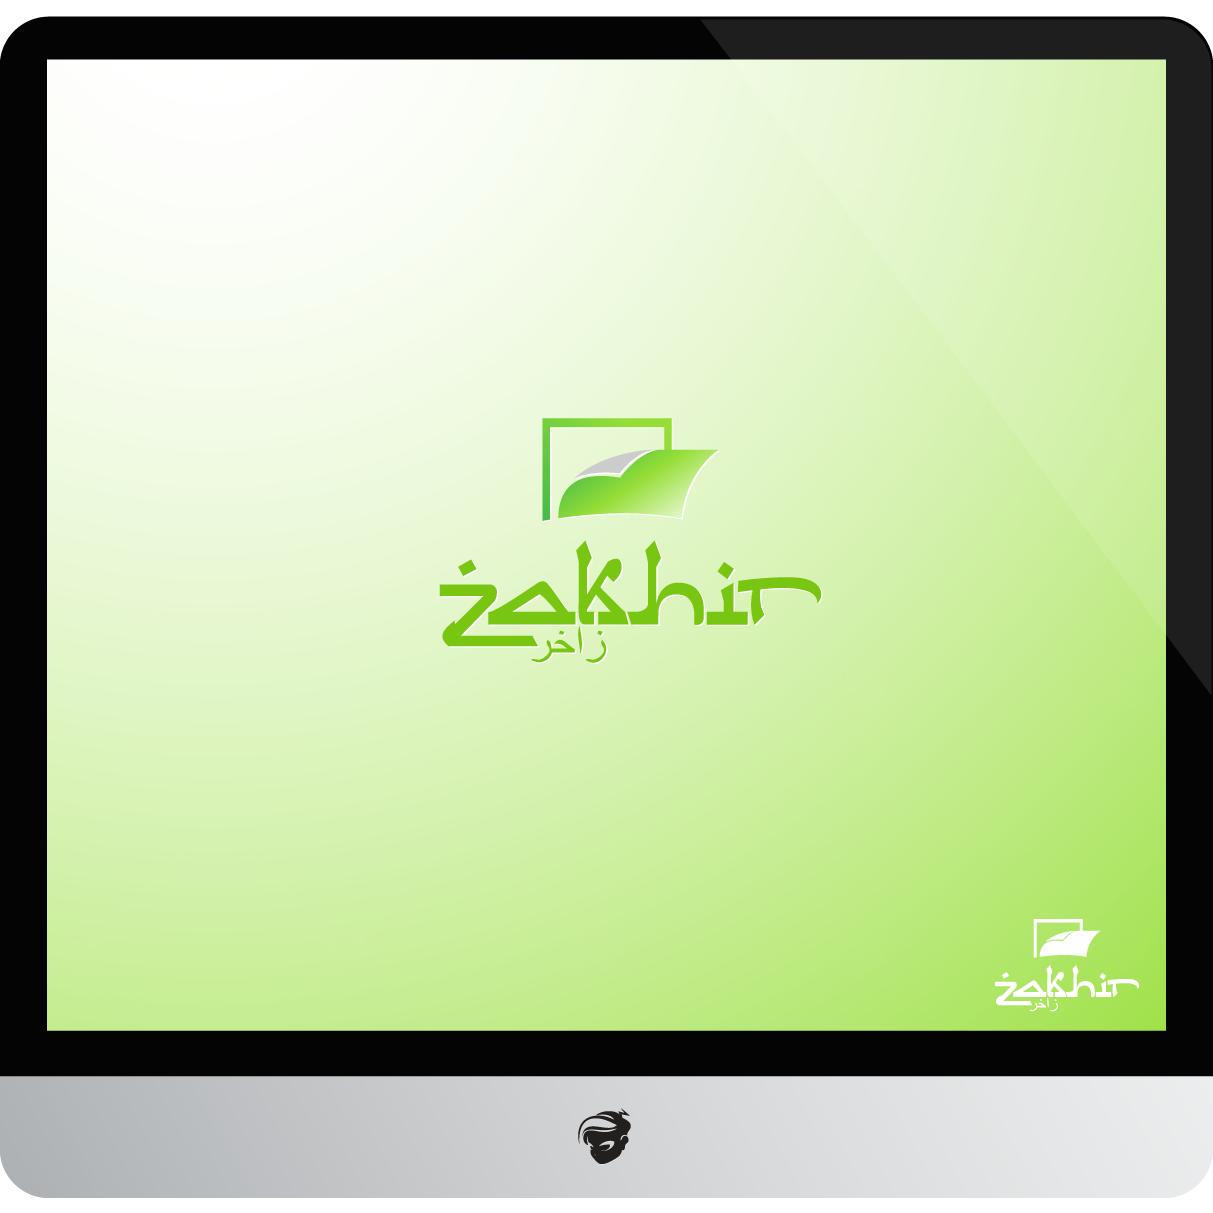 Logo Design by zesthar - Entry No. 62 in the Logo Design Contest Zakhir Logo Design.